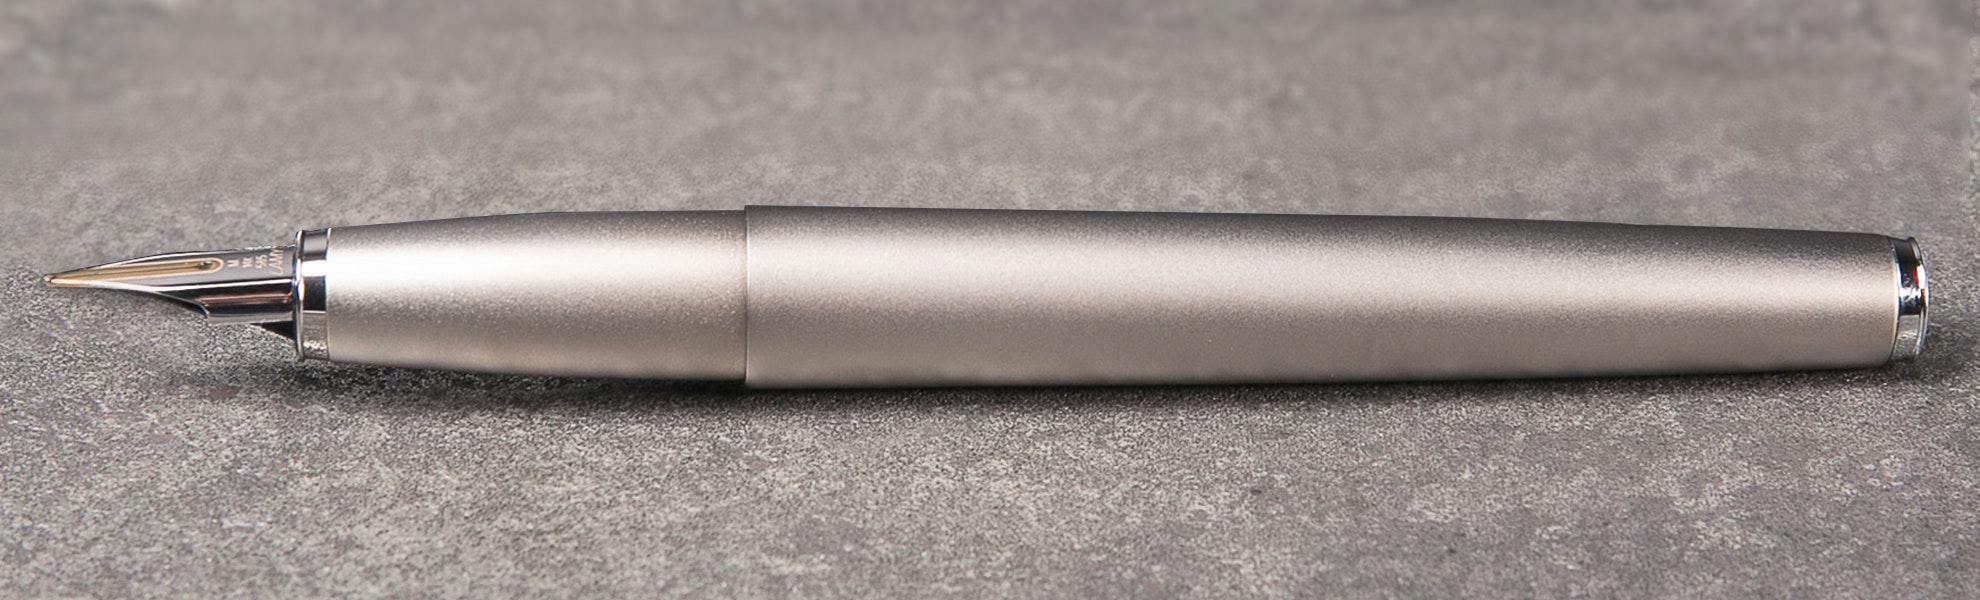 LAMY Studio Fountain Pen w/ 14K Gold Nib